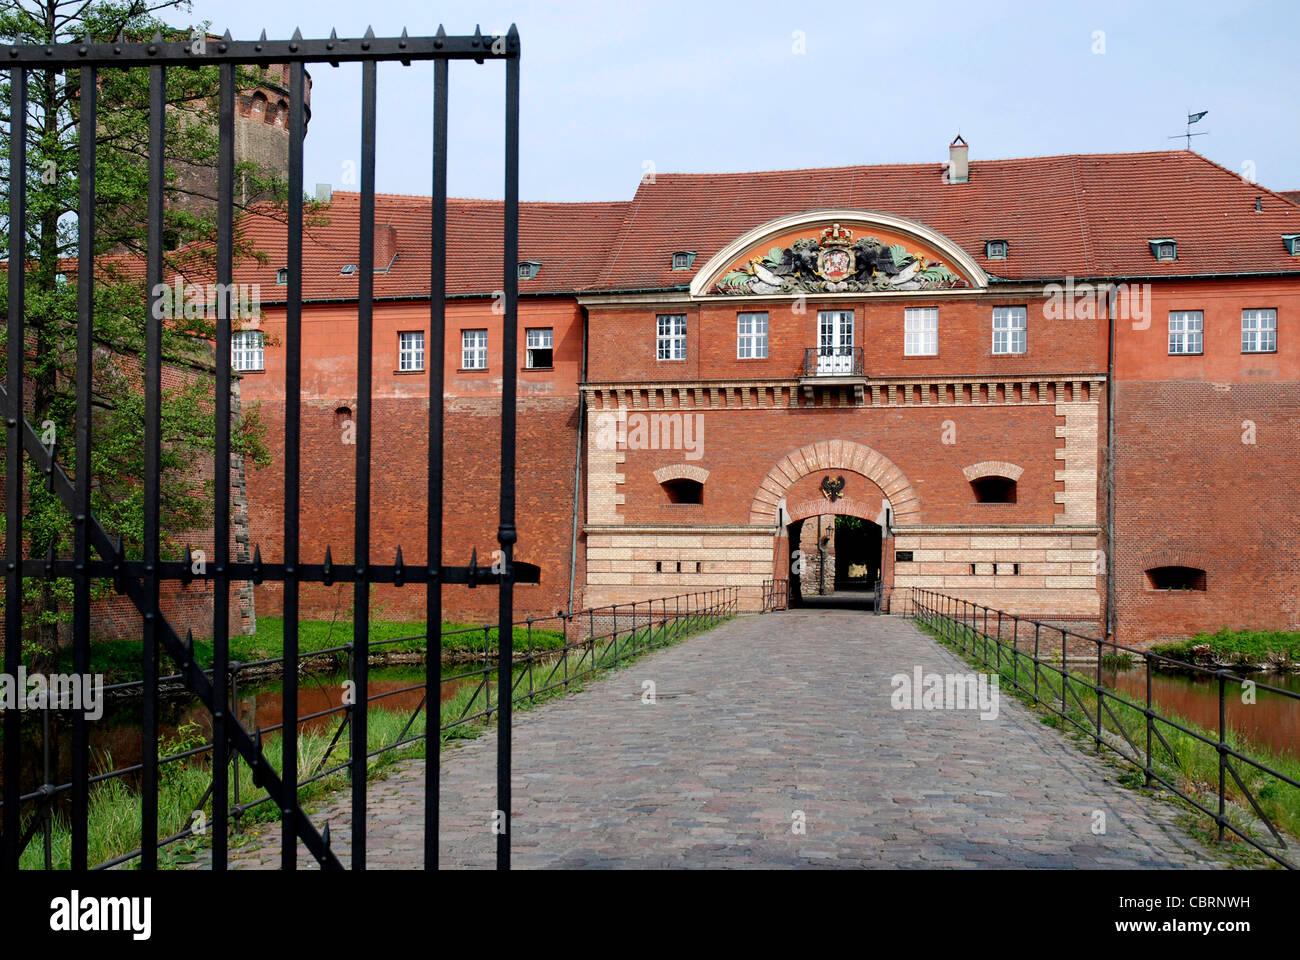 Spandau Citadel in Berlin with man gate and Juliusturm. - Stock Image